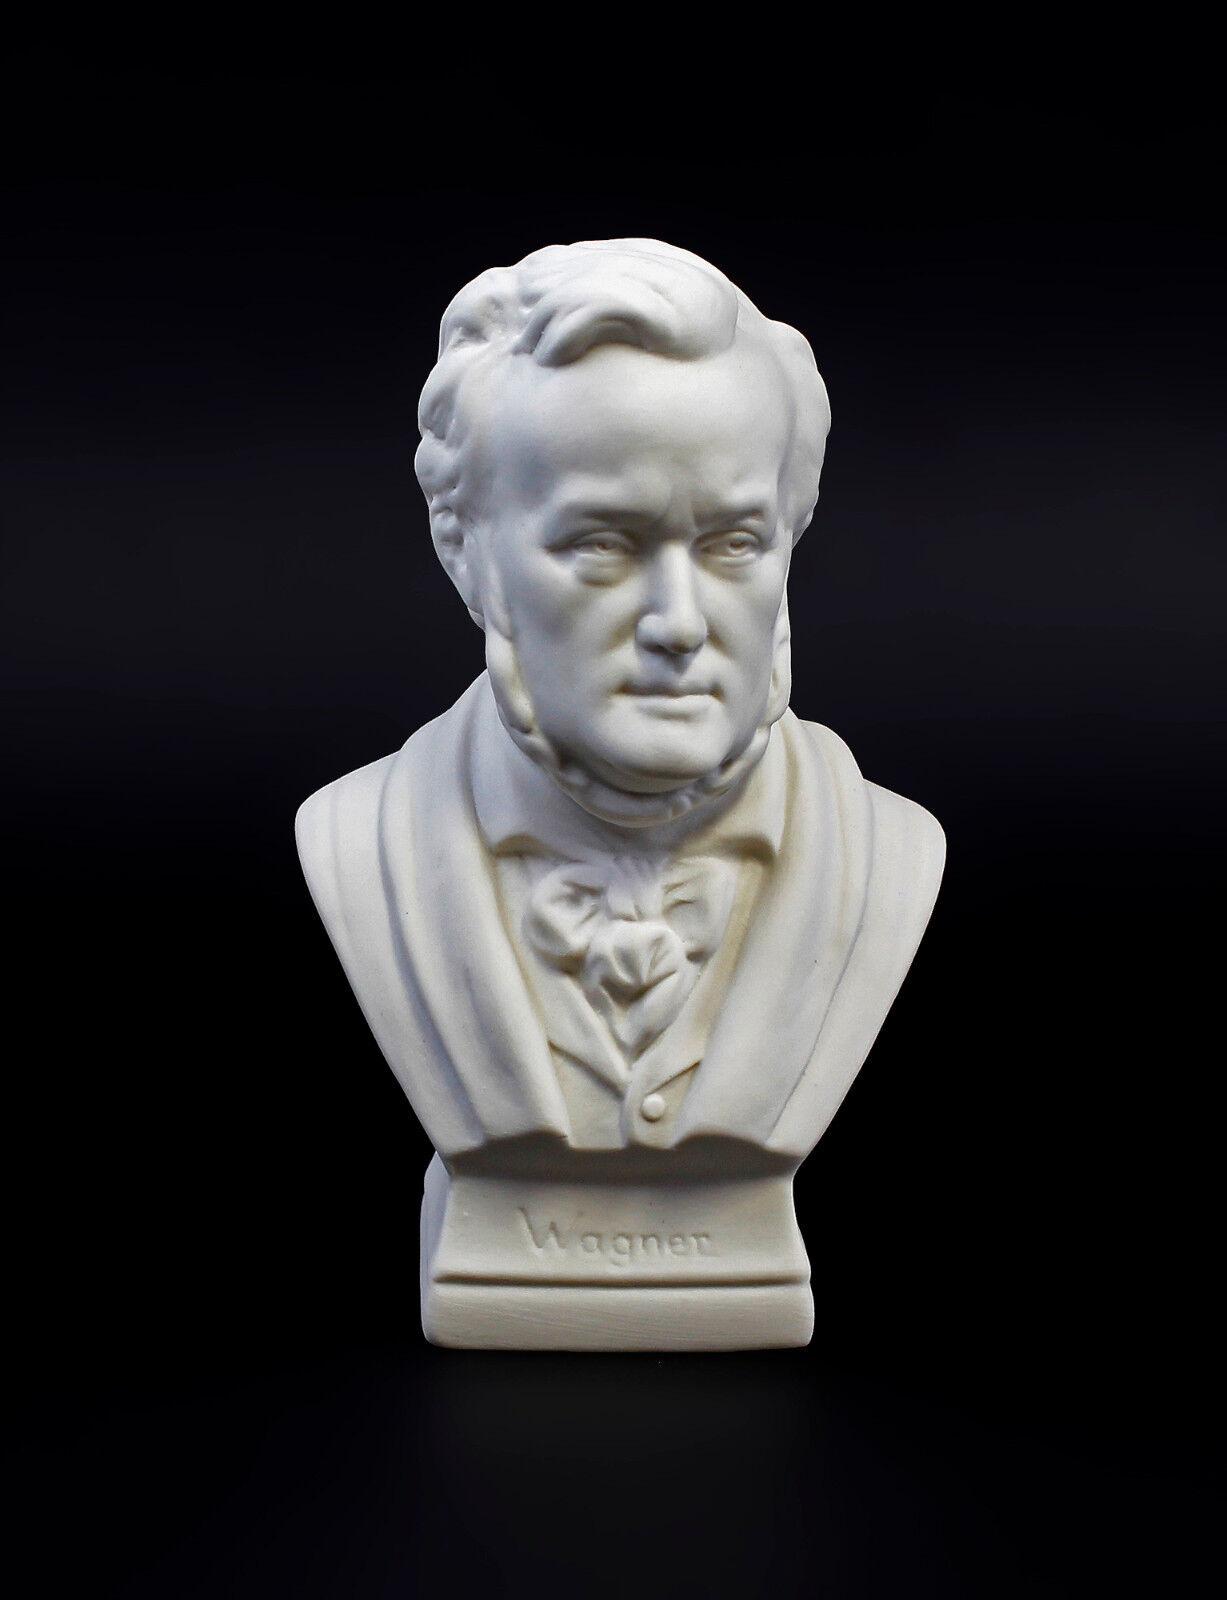 9941498 busto wagner bisquit ens E. frijol-marca h13, 5cm